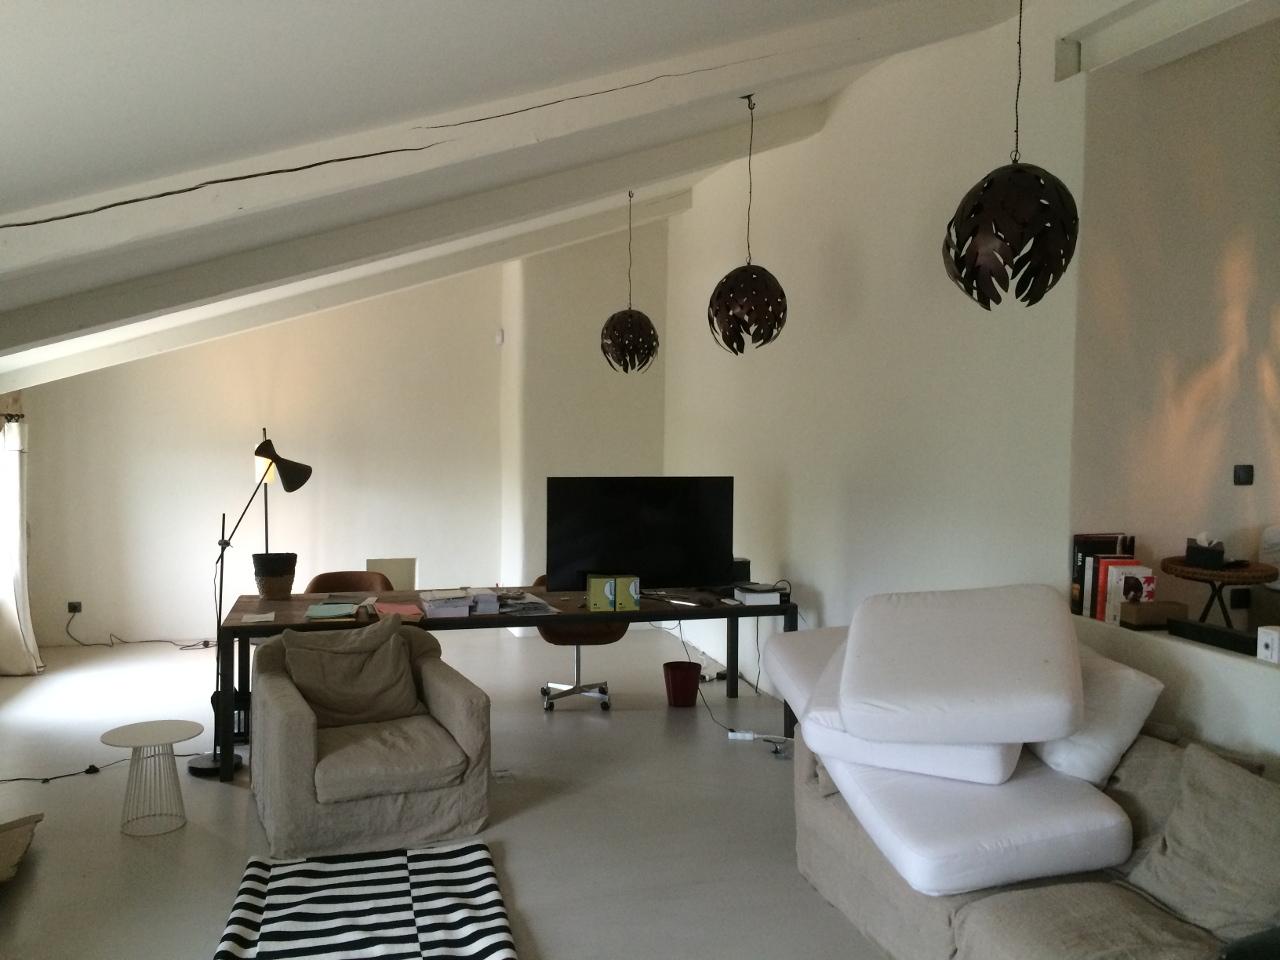 b ton cir archives sols techniques. Black Bedroom Furniture Sets. Home Design Ideas